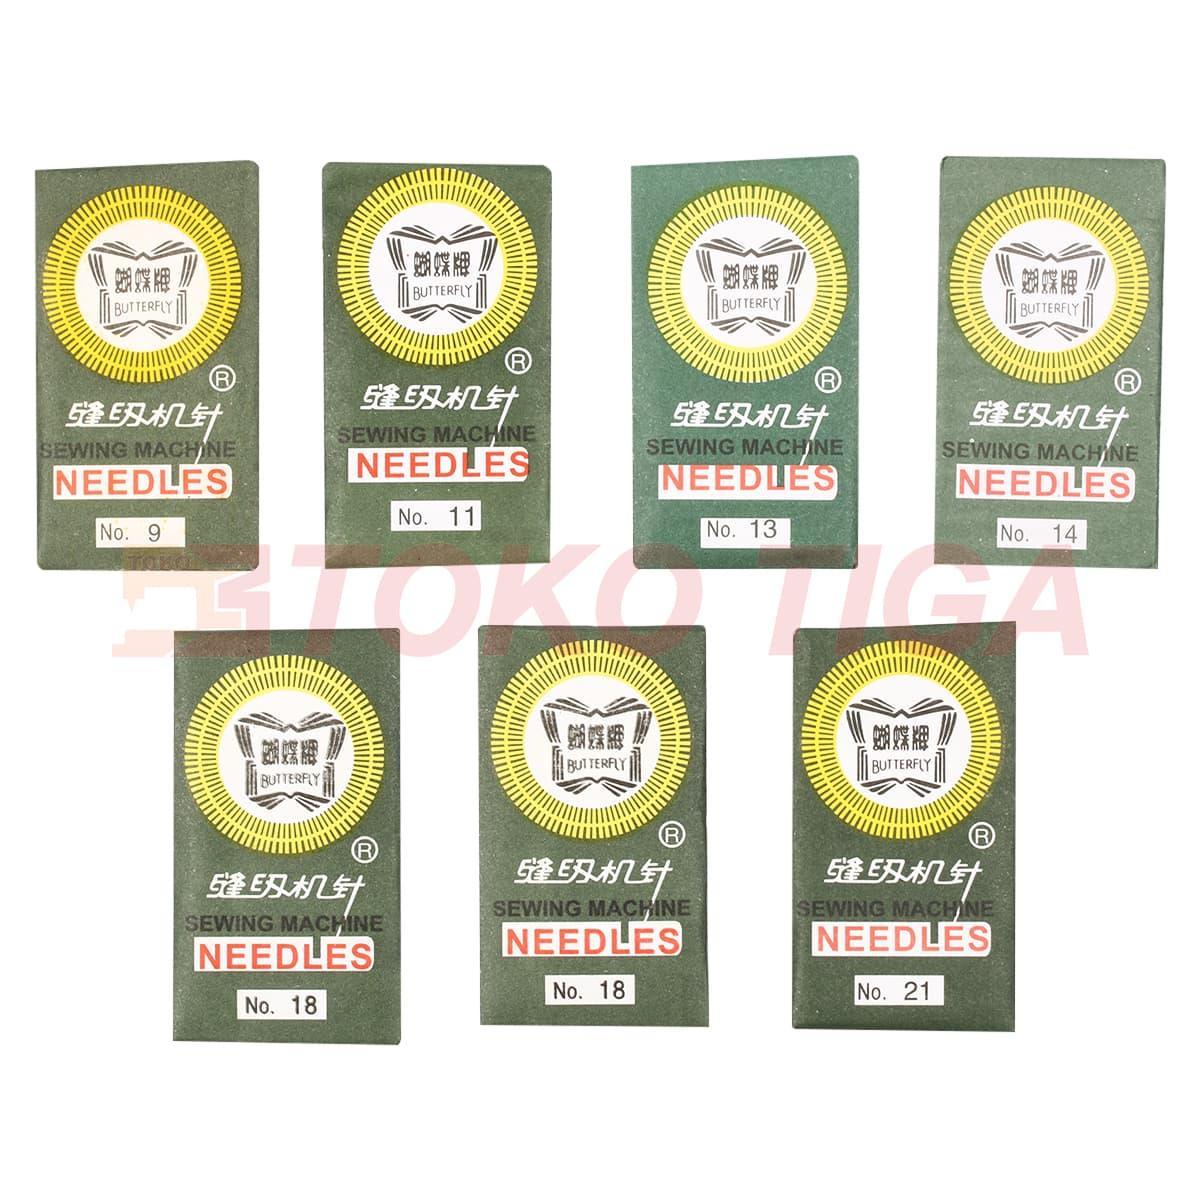 Fitur Promo Termurah Jarum Mesin Jahit Merk Butterfly Portable Jh 8190s Multifungsi 4